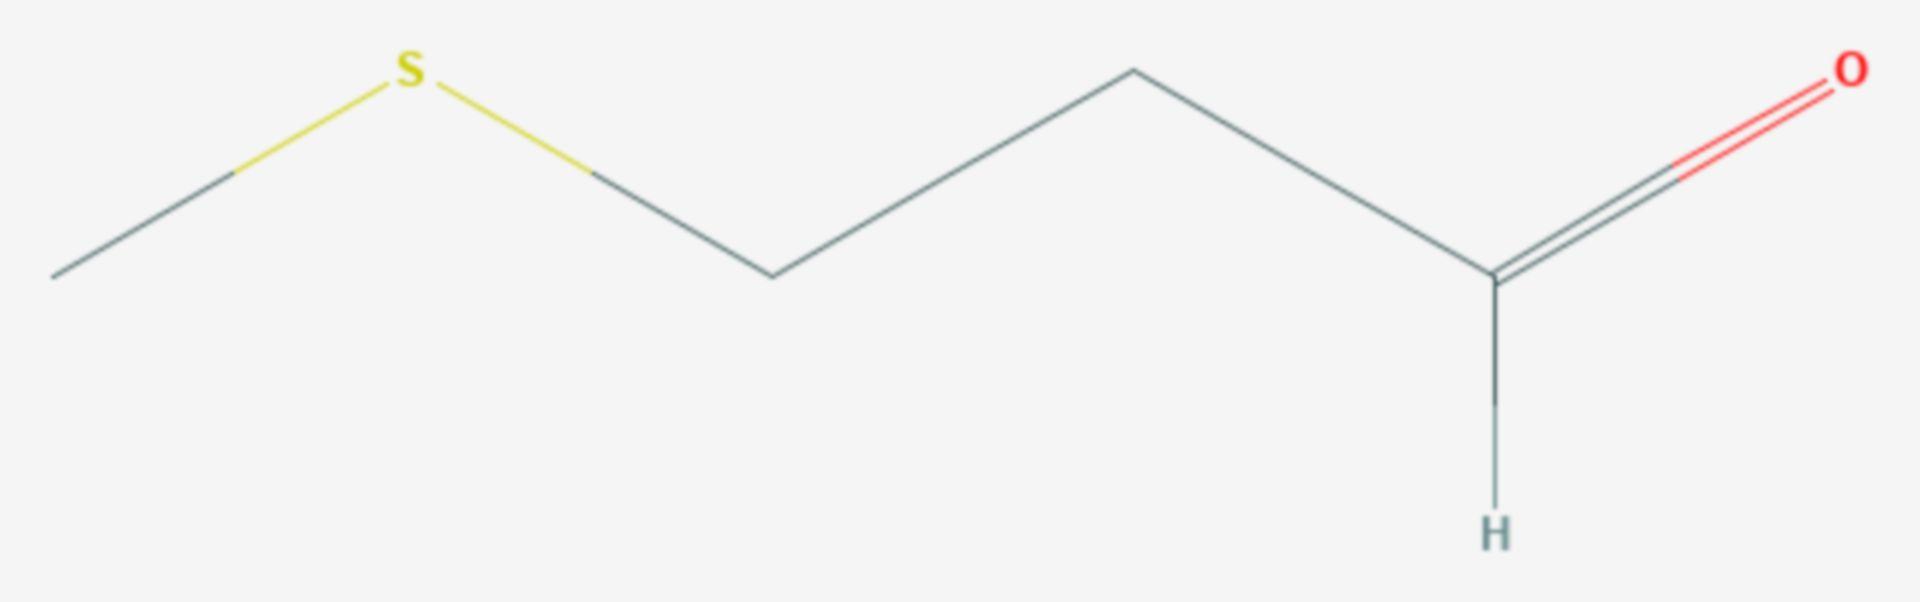 Methional (Strukturformel)